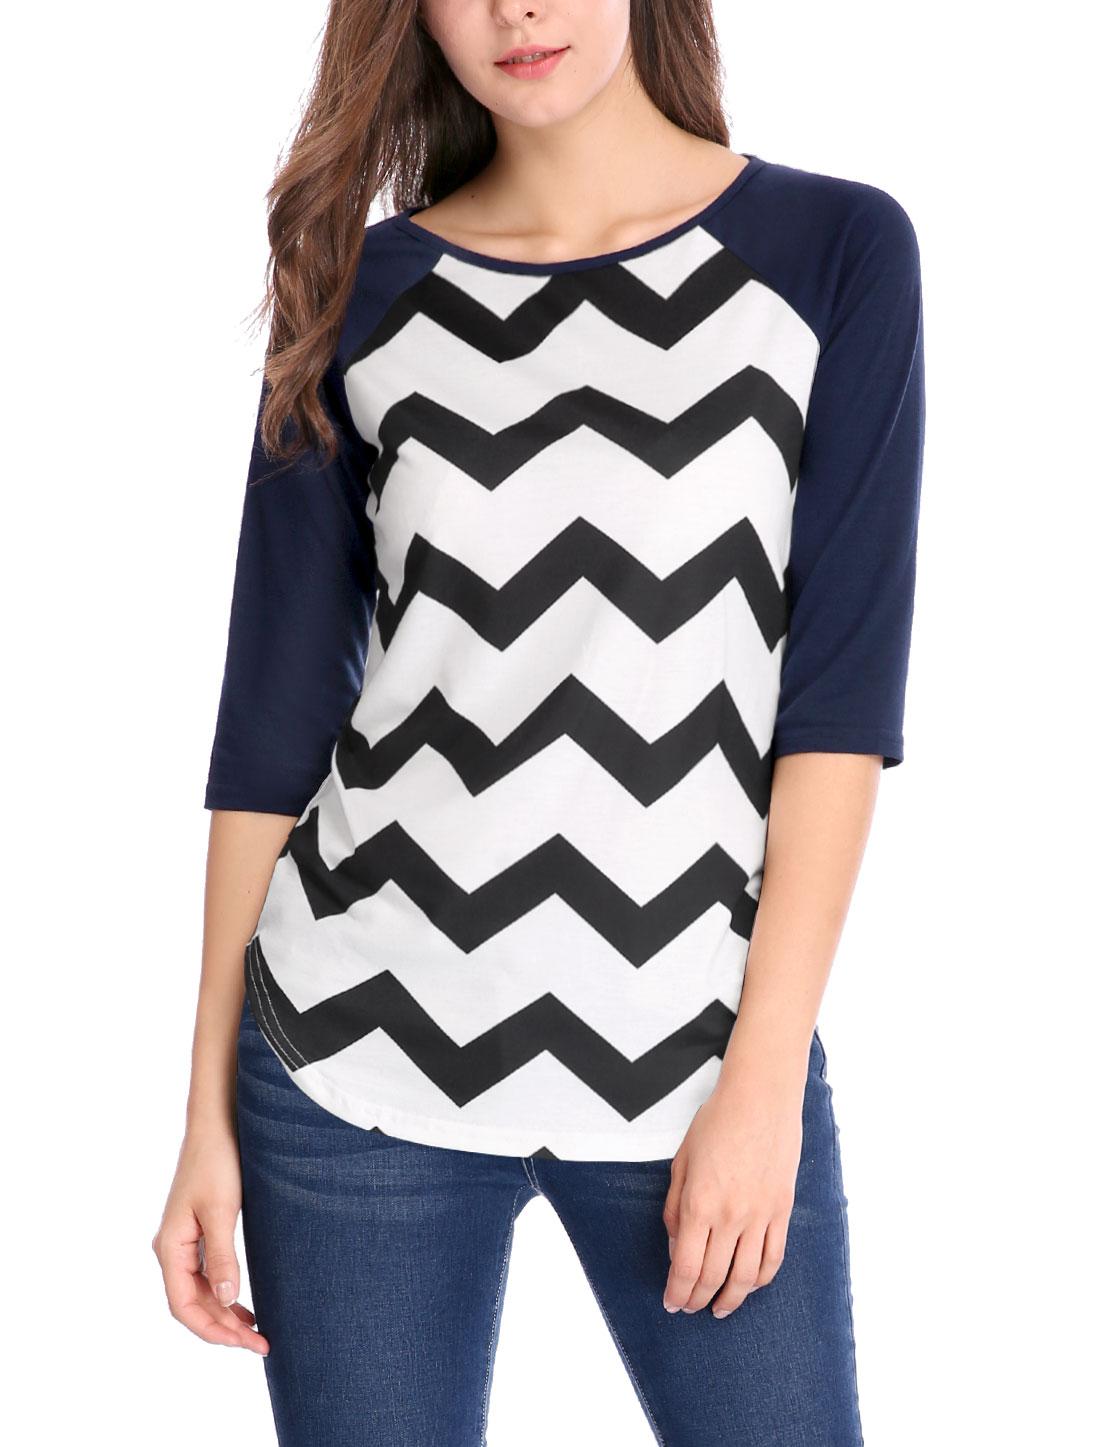 Women Chevron Contrast Color 3/4 Raglan Sleeves Top White L